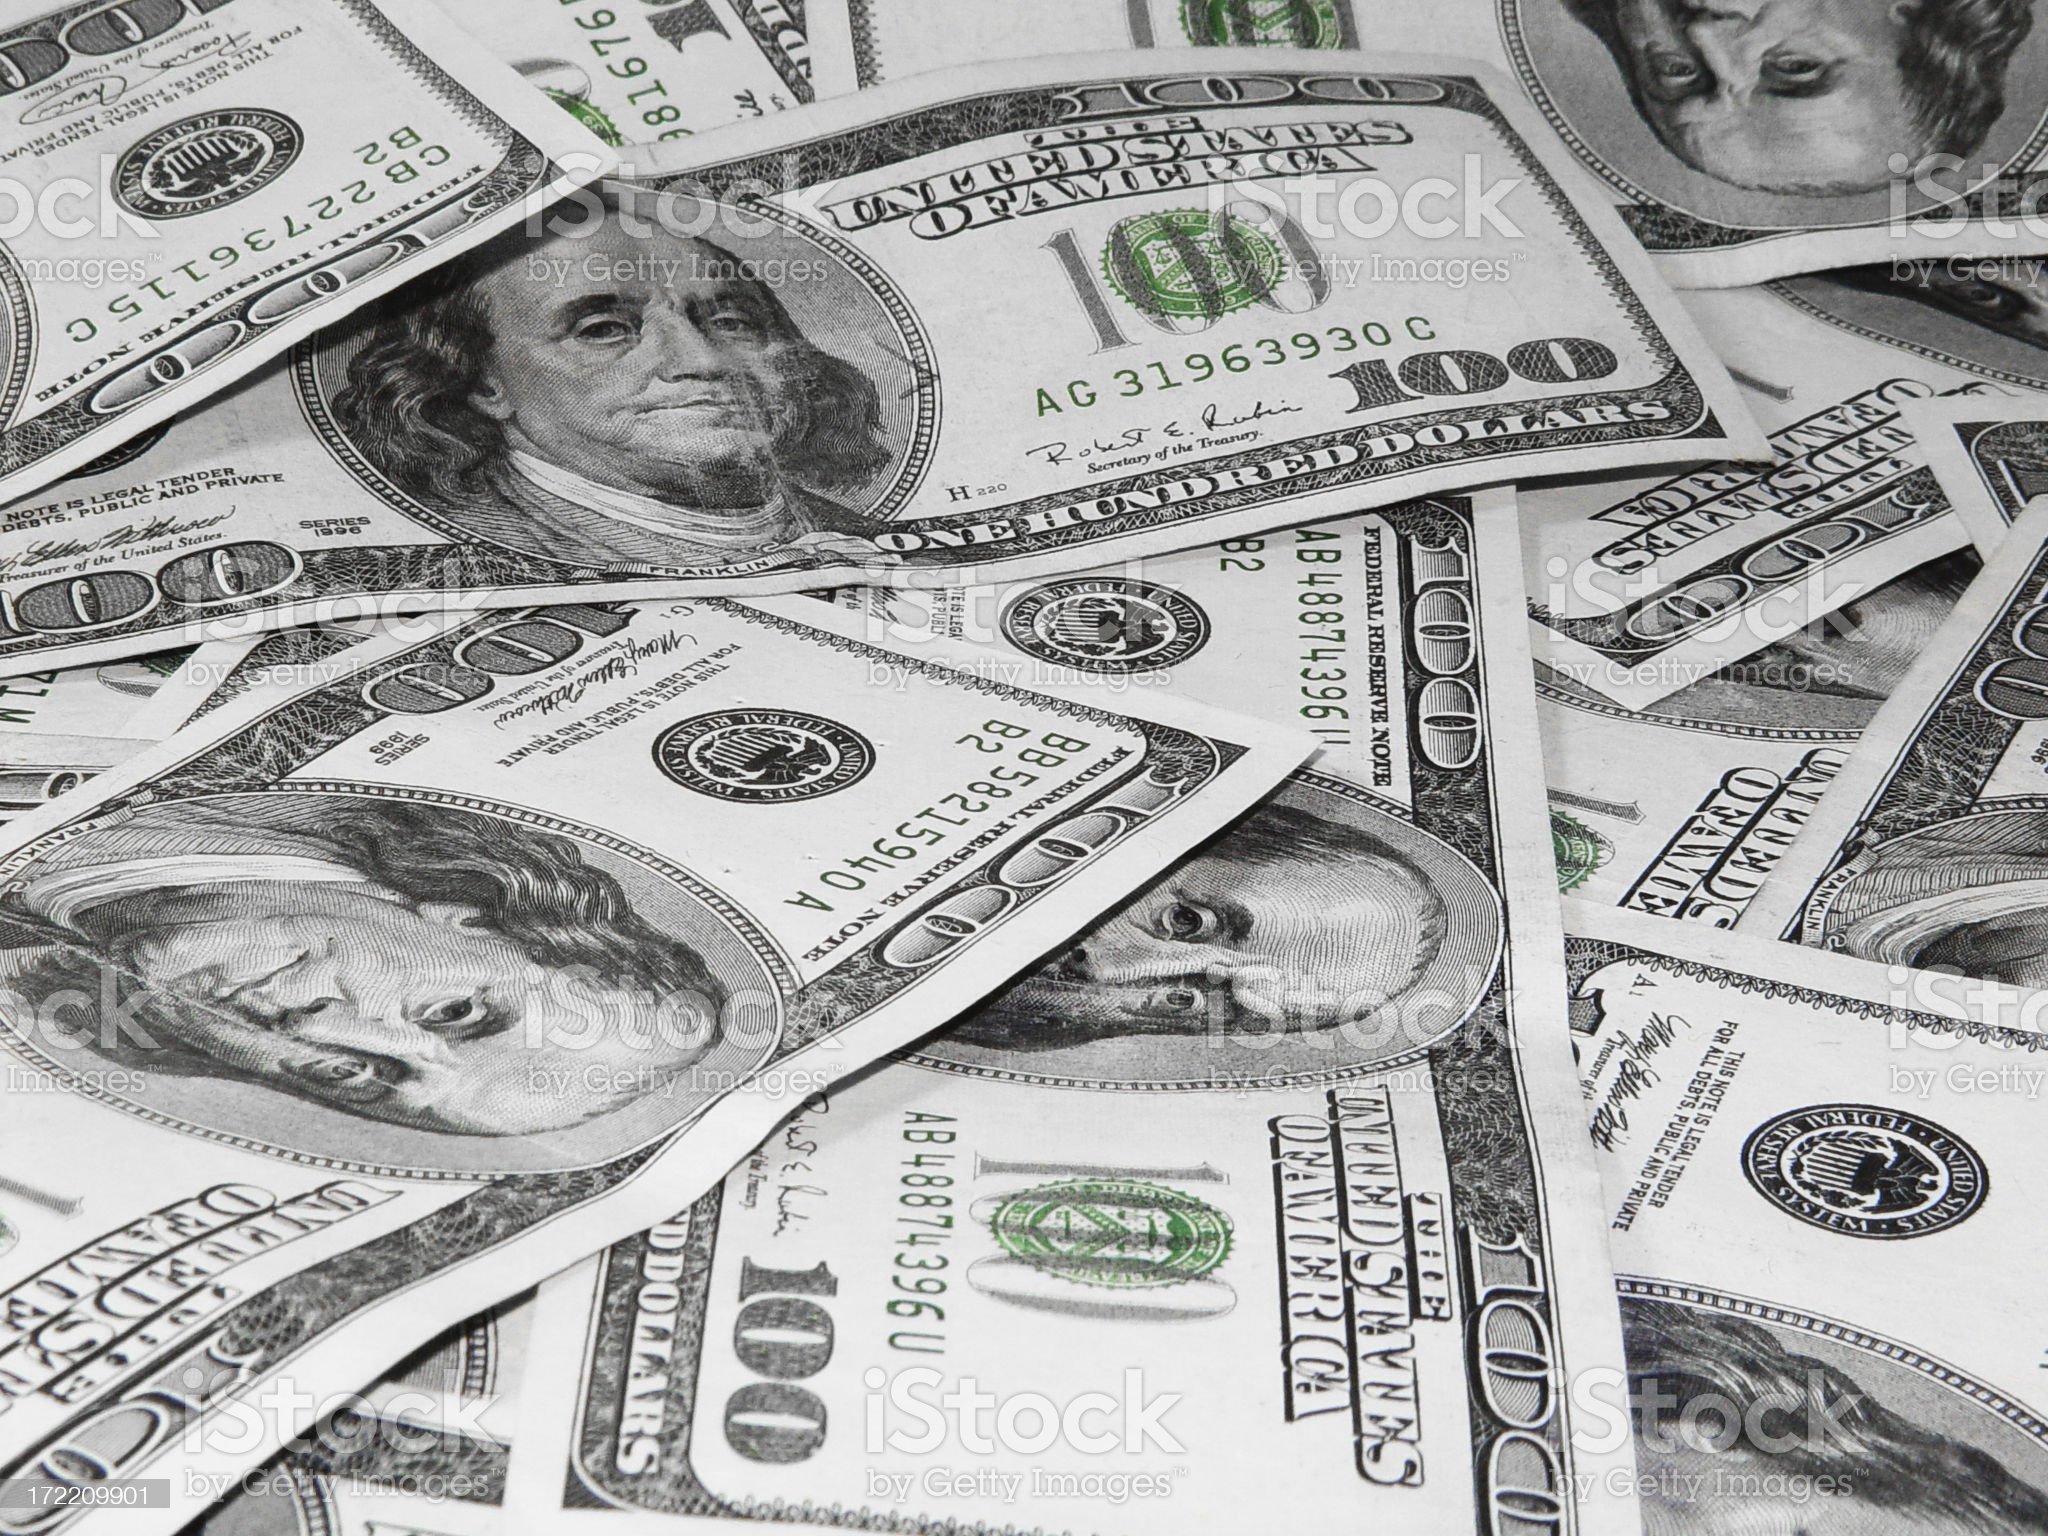 Money Background Finance Banking royalty-free stock photo